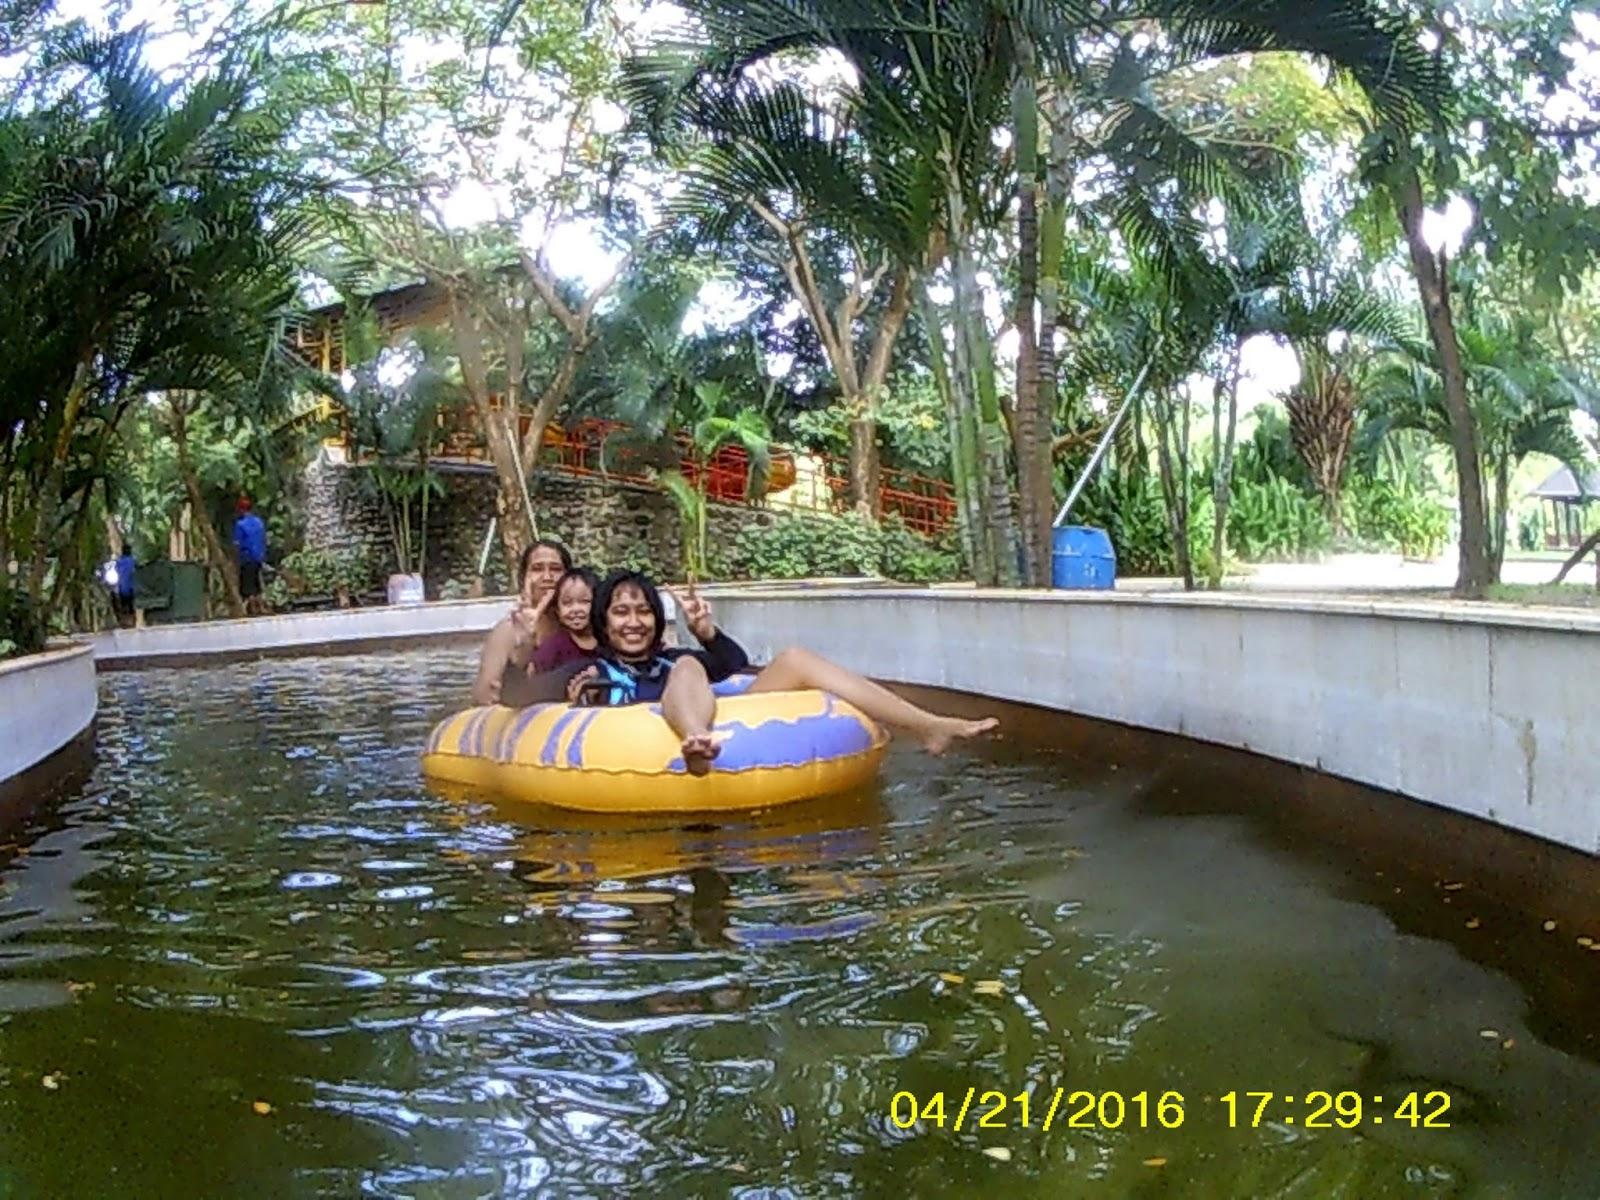 Wisata Gowa Makassar Gdp Discovery Park Diantaranya 3 Wahana Bermain